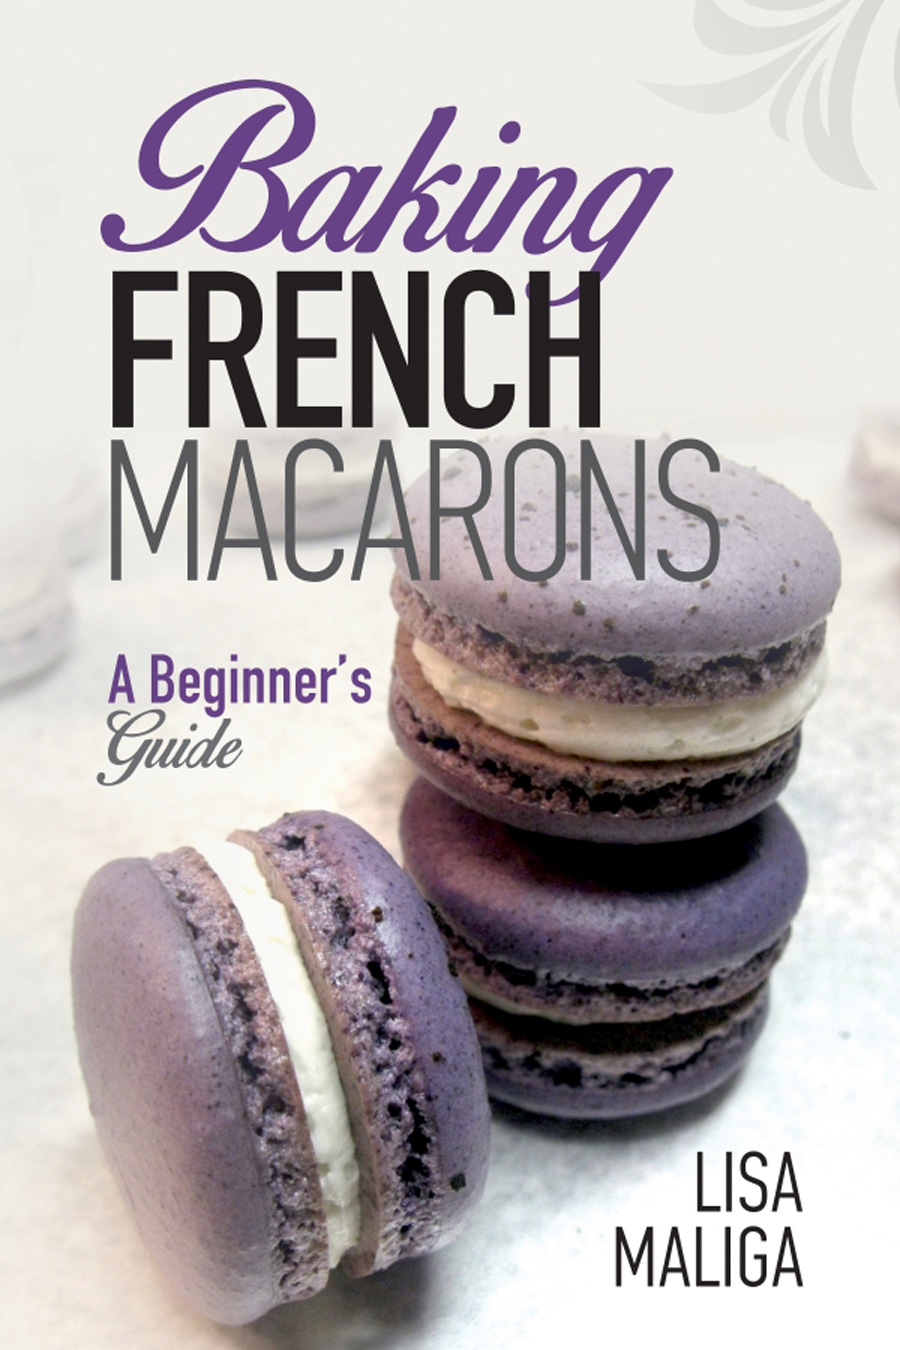 Baking-French-Macarons-by-Lisa-Maliga.jpg